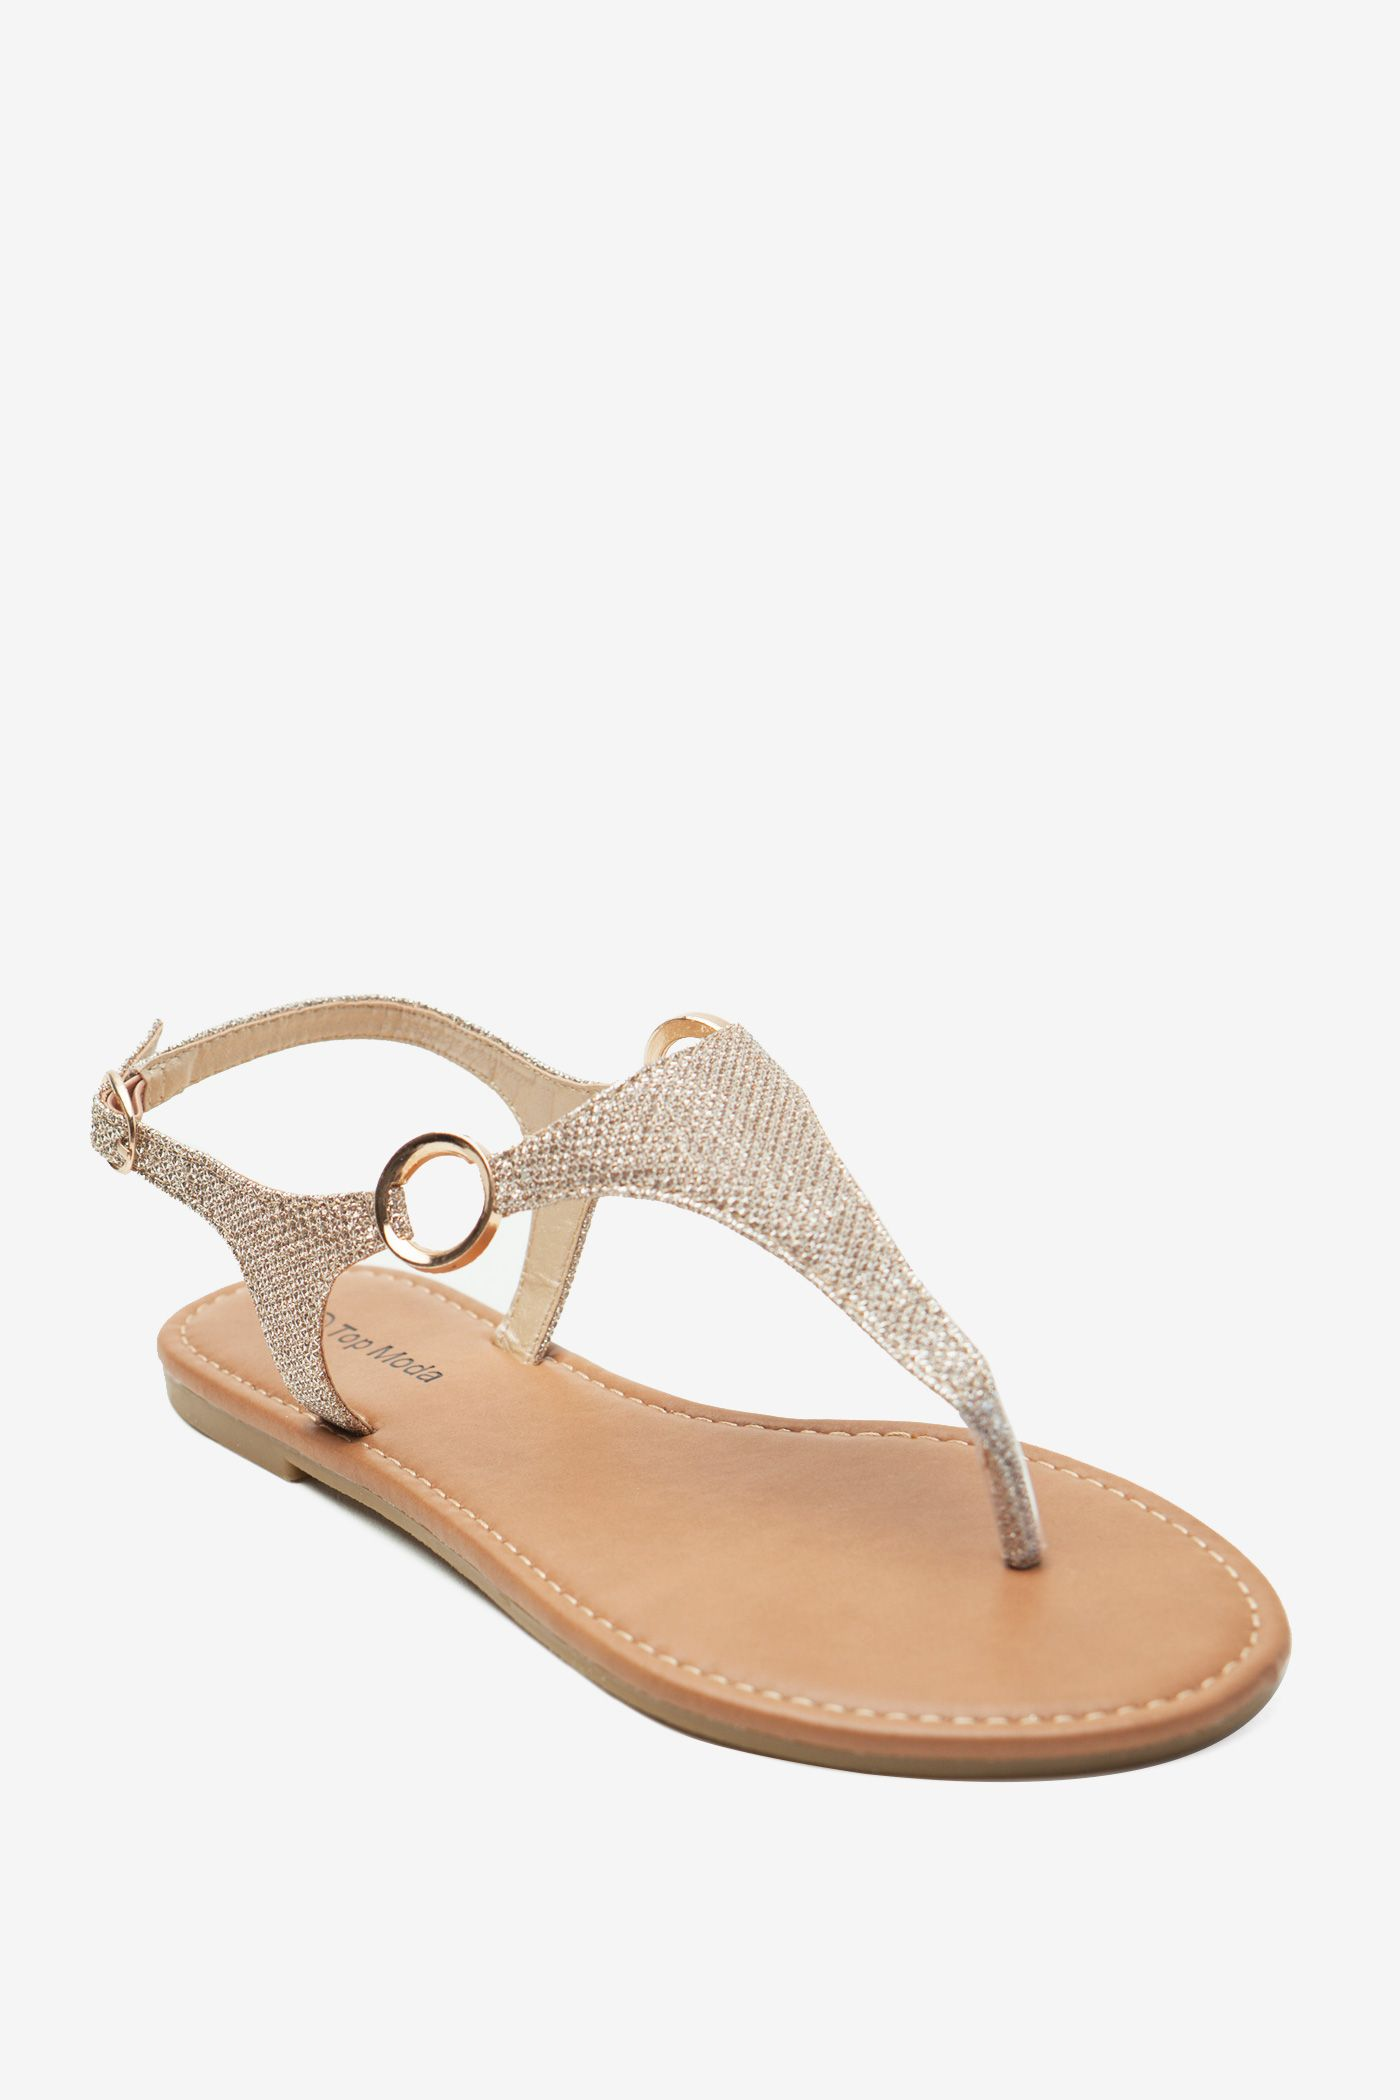 Women's Sandals | Break-10 Spring Glitz Sandal | A'GACI